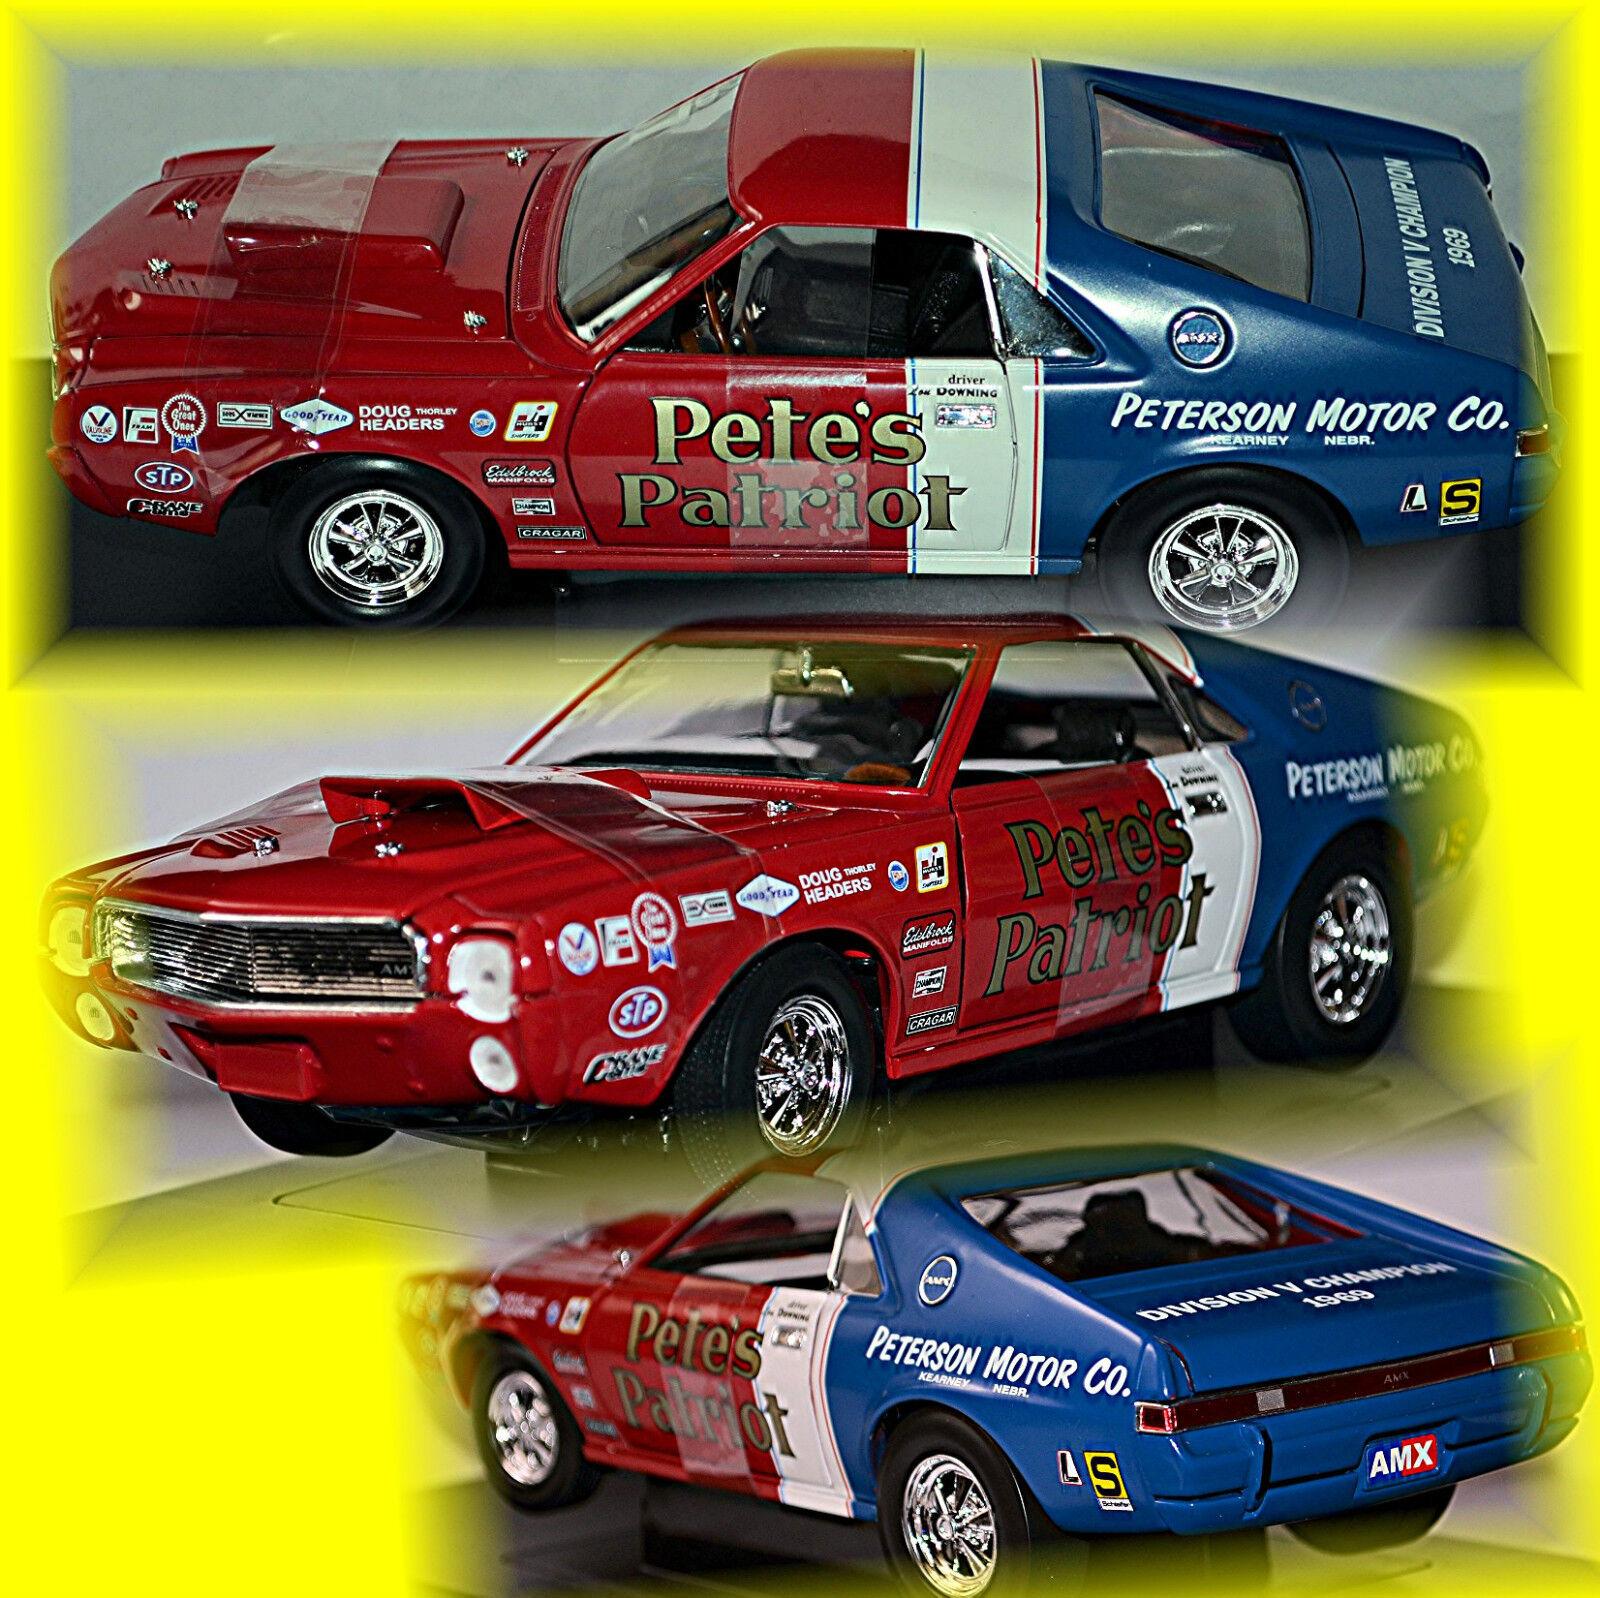 Amc racing'69 S s AMX 1969 pete's patriota rosso blu-rosso blu 1 18 Ertl